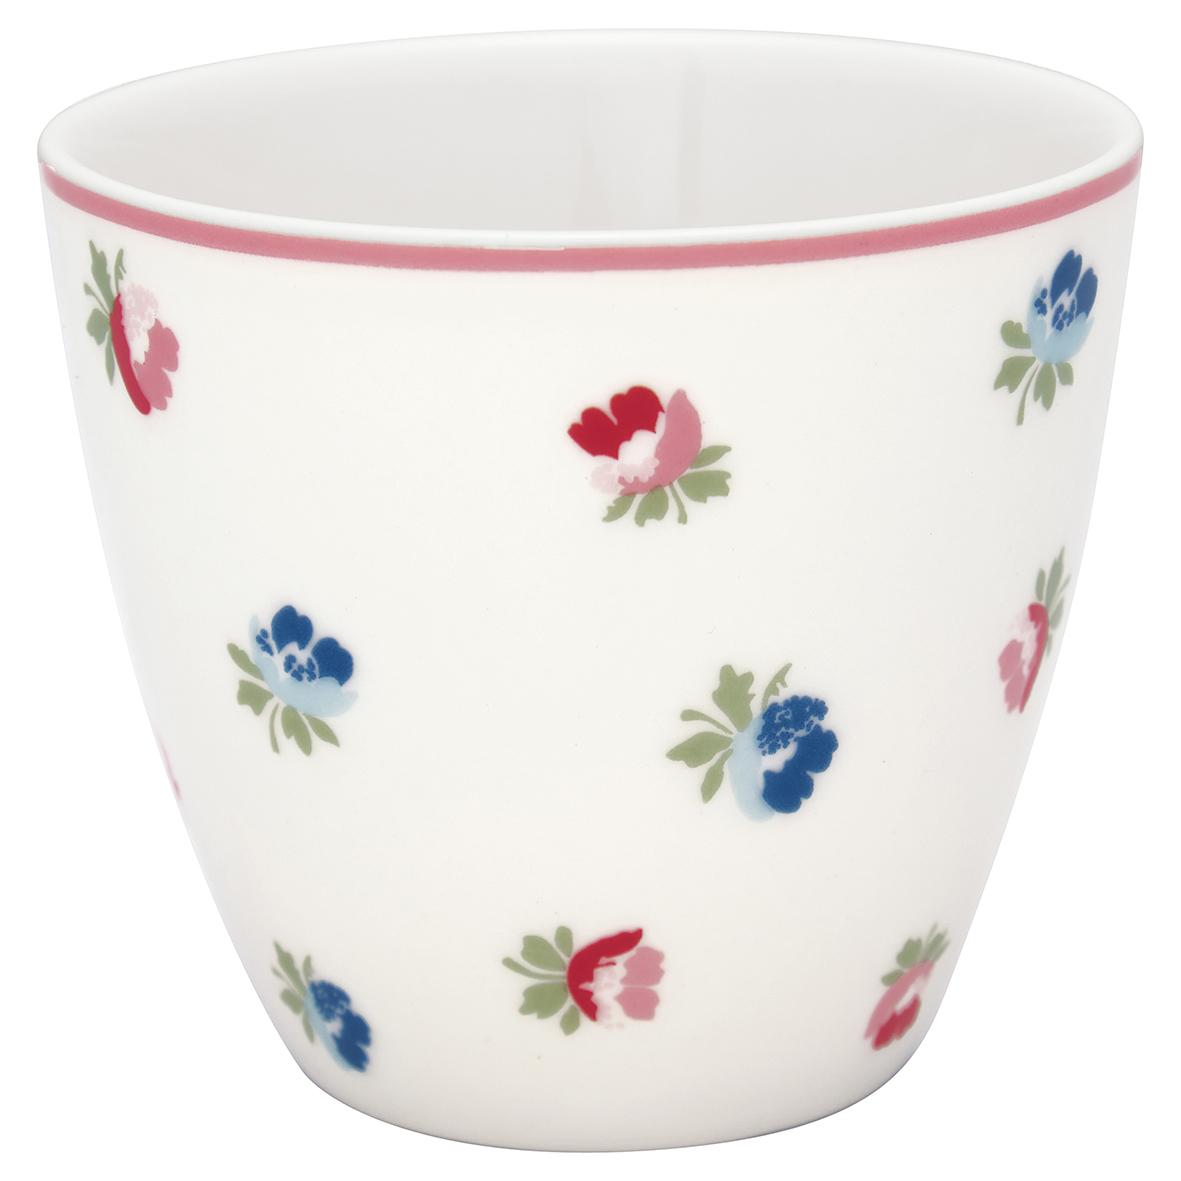 Latte Cup - Viola white - Greengate